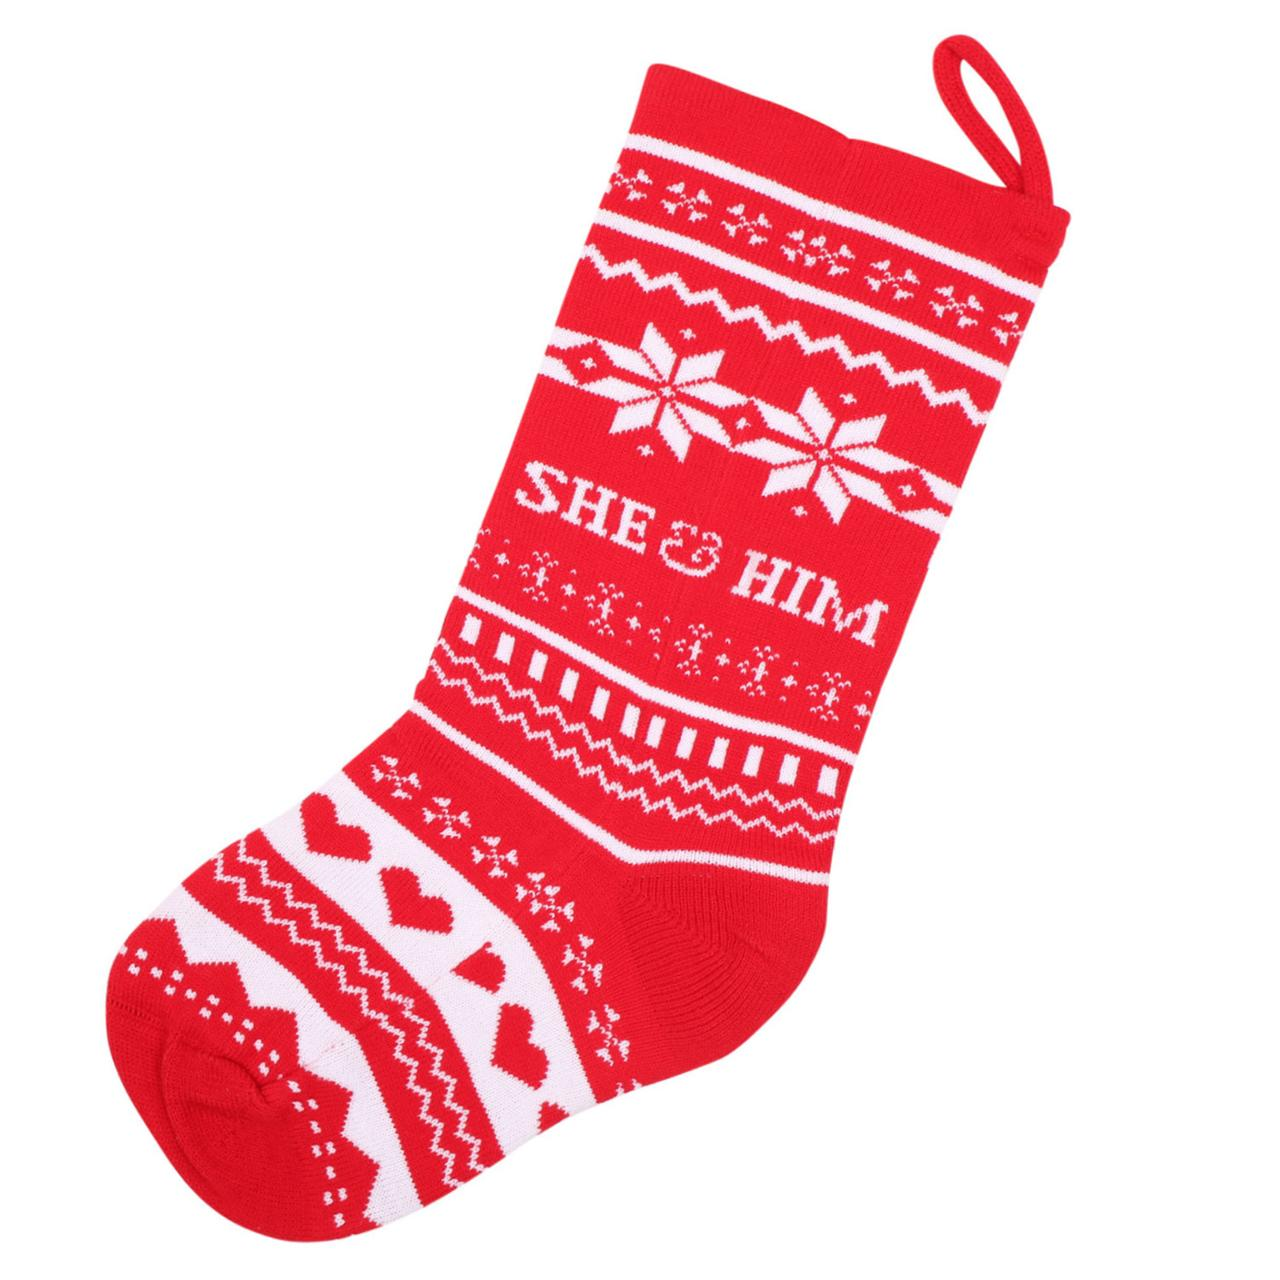 She him knit christmas stocking